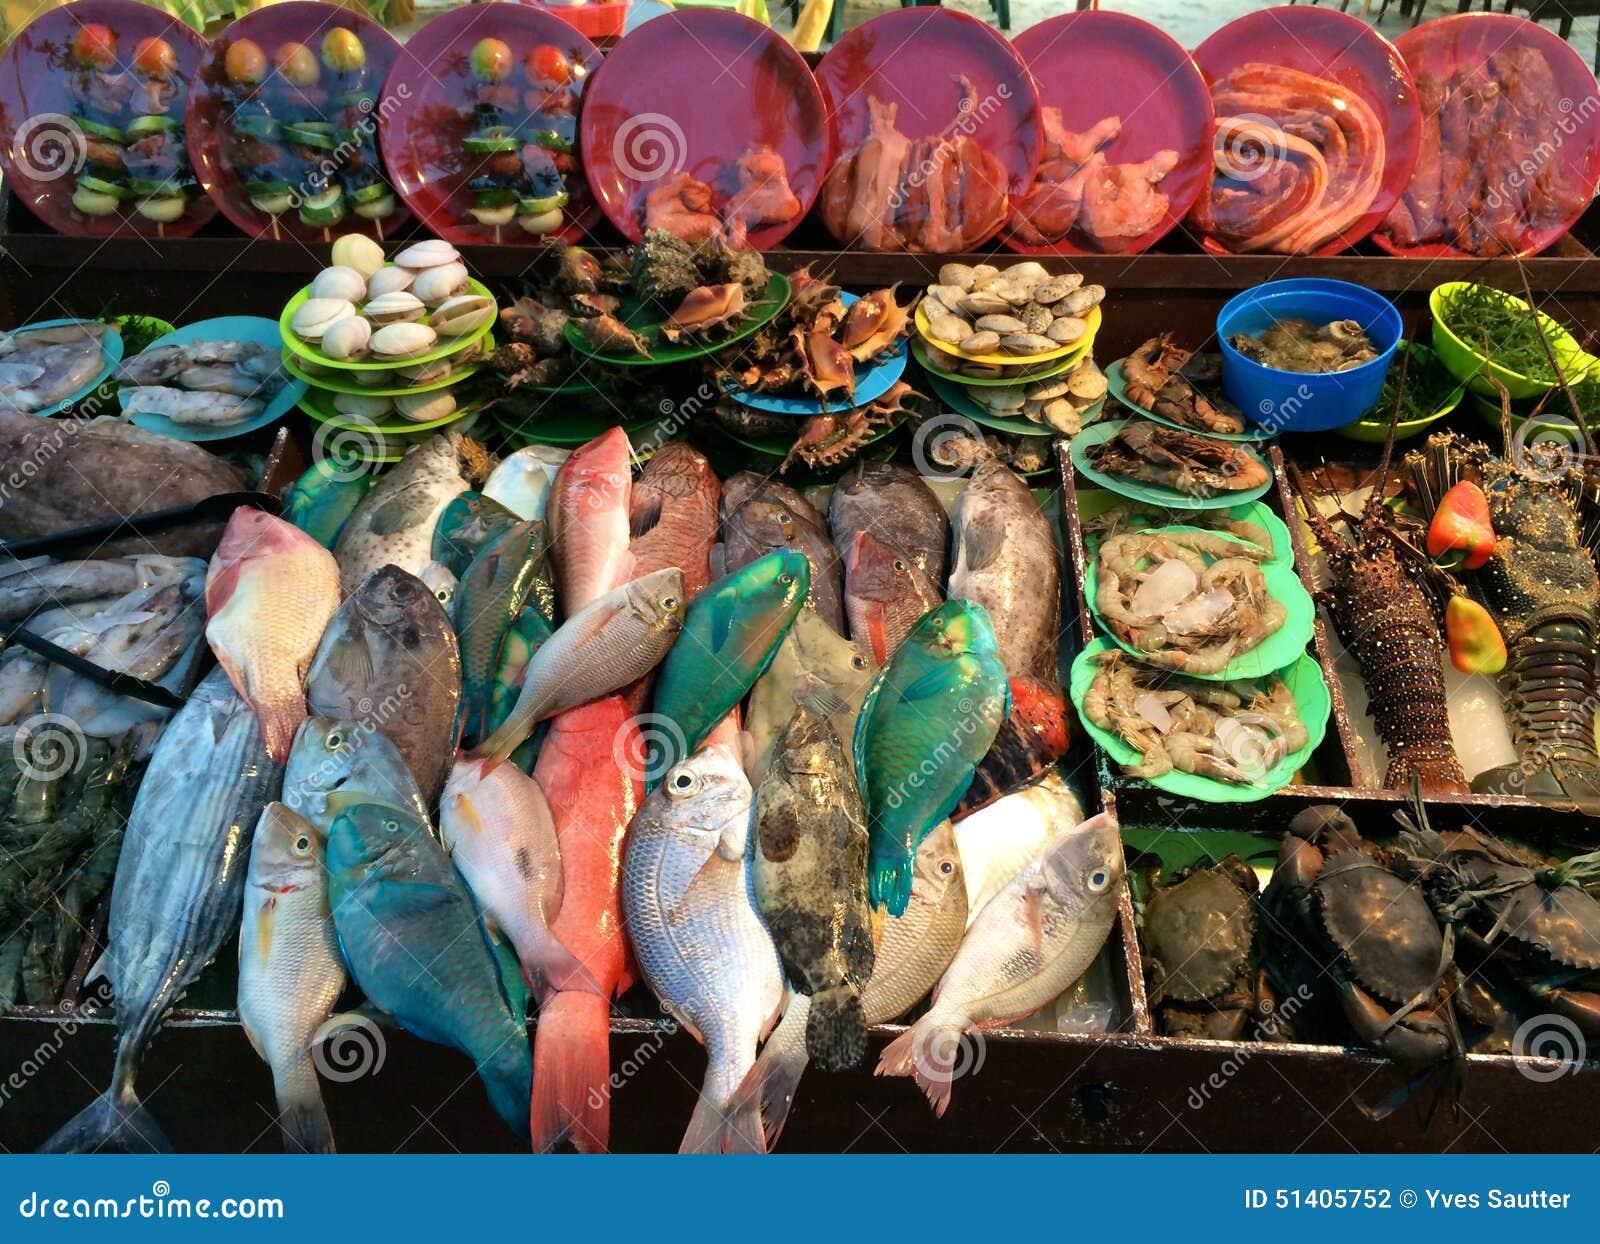 Fish Market, Alona Beach, Panglao Philippines Stock Photo - Image: 51405752